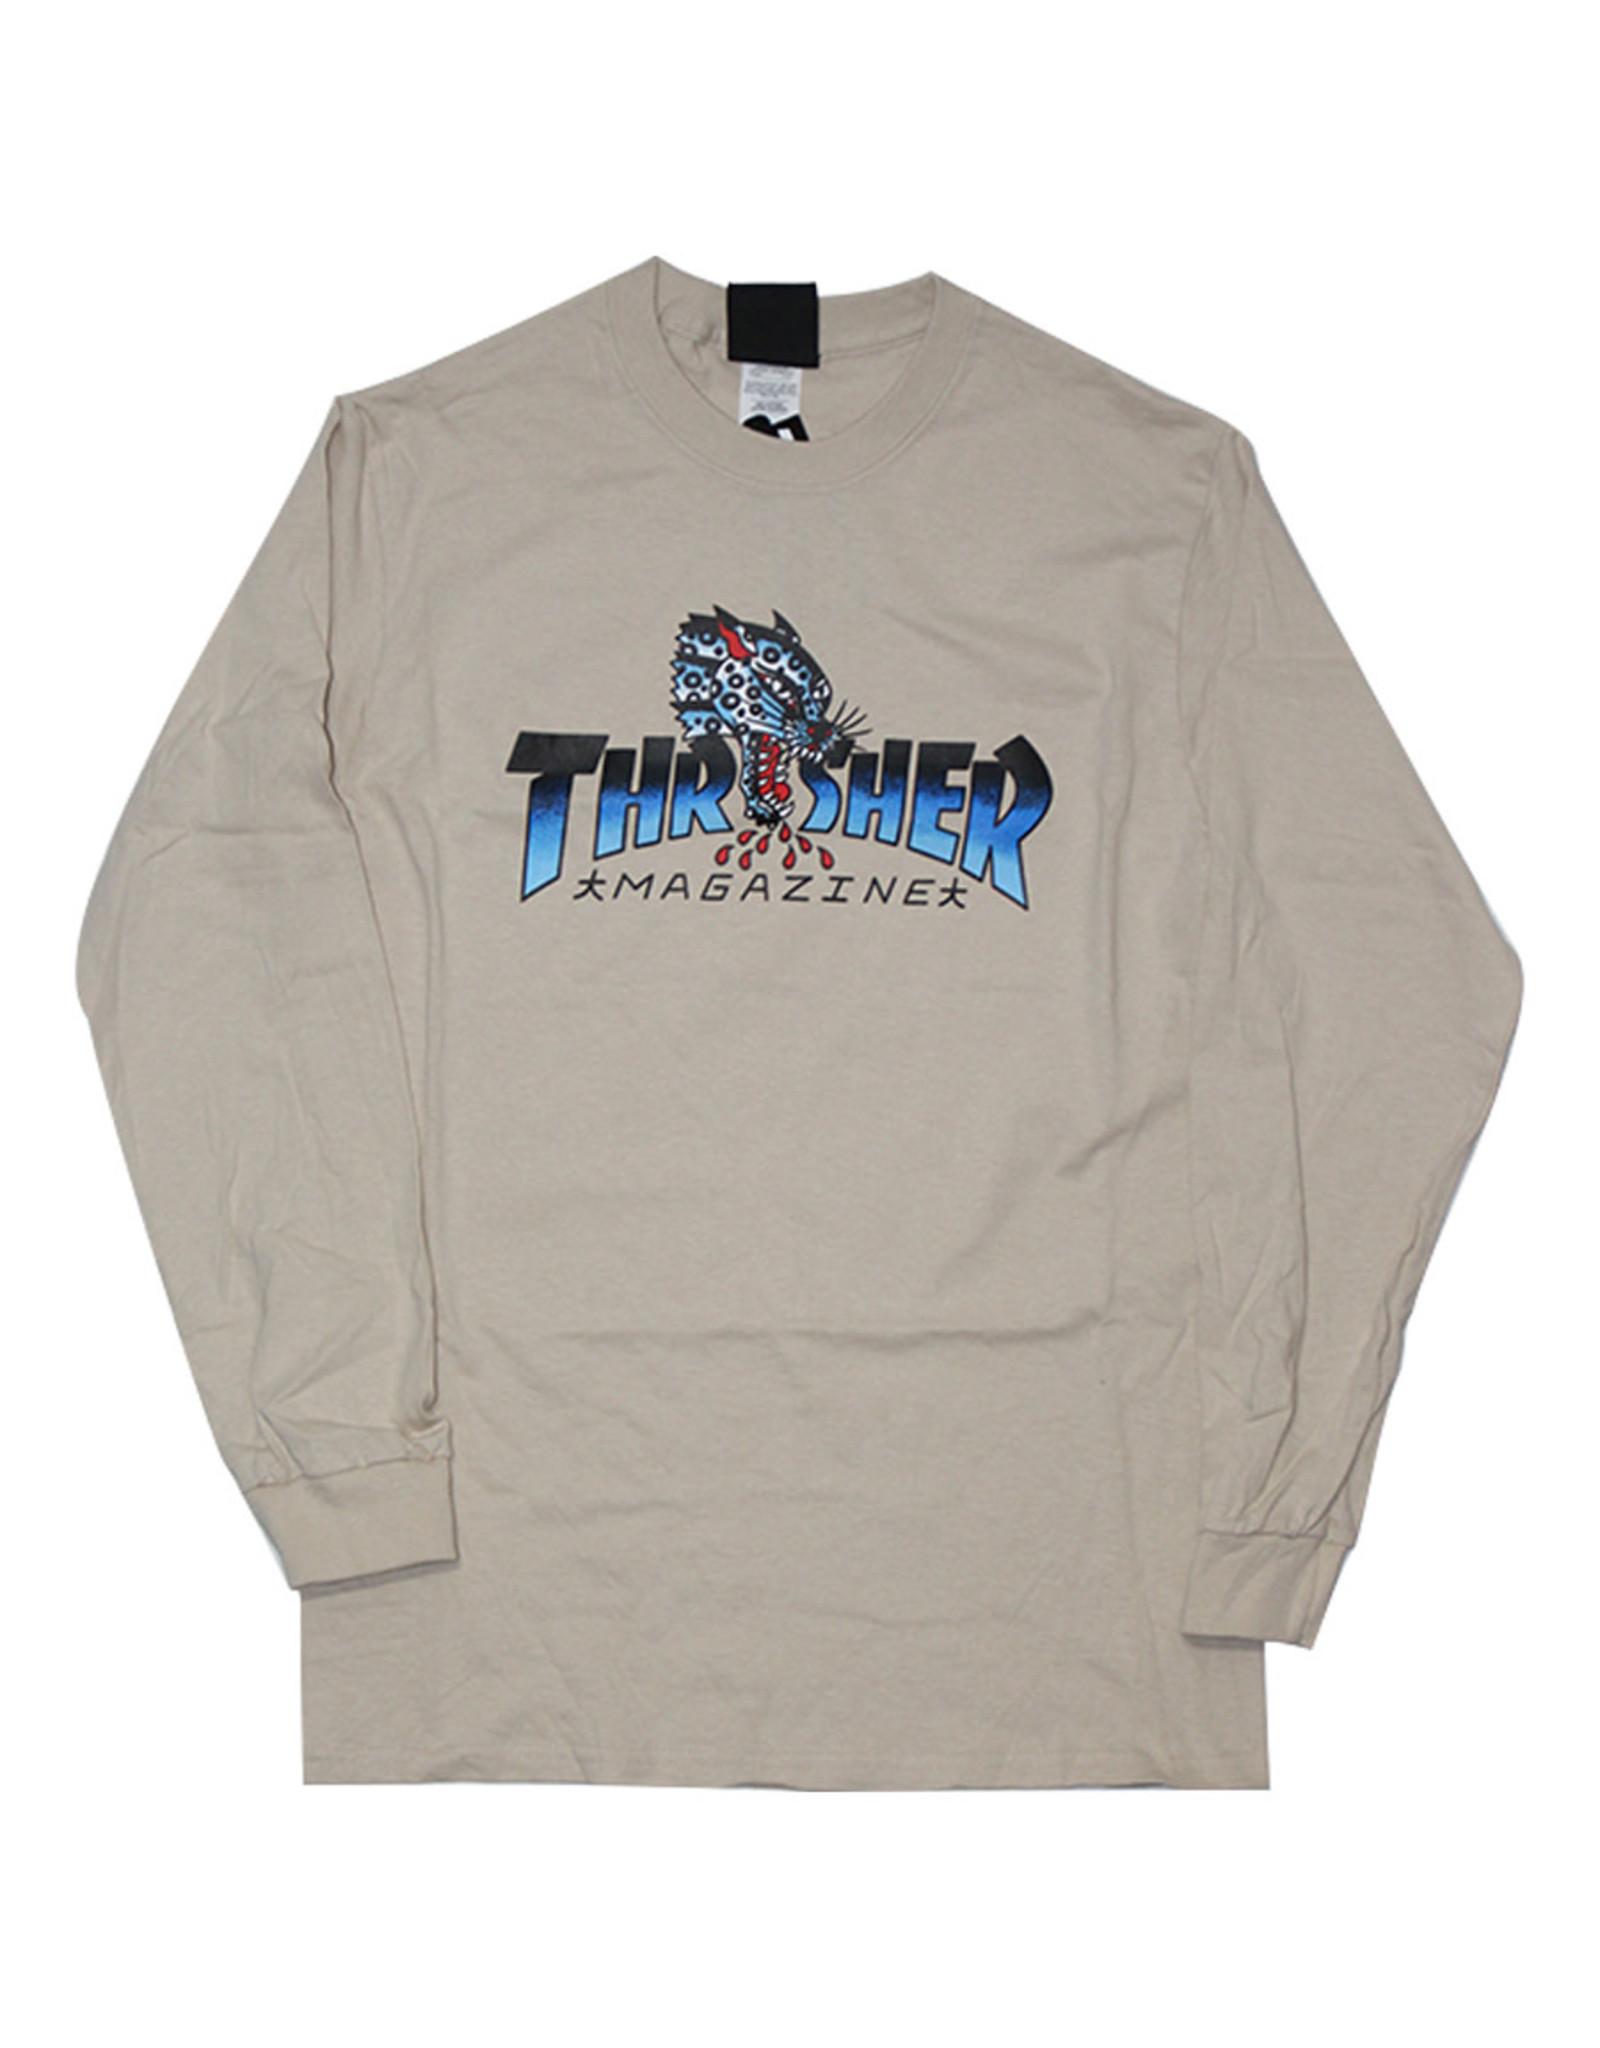 Thrasher Thrasher Tee Mens Leopard Mag L/S (Sand)